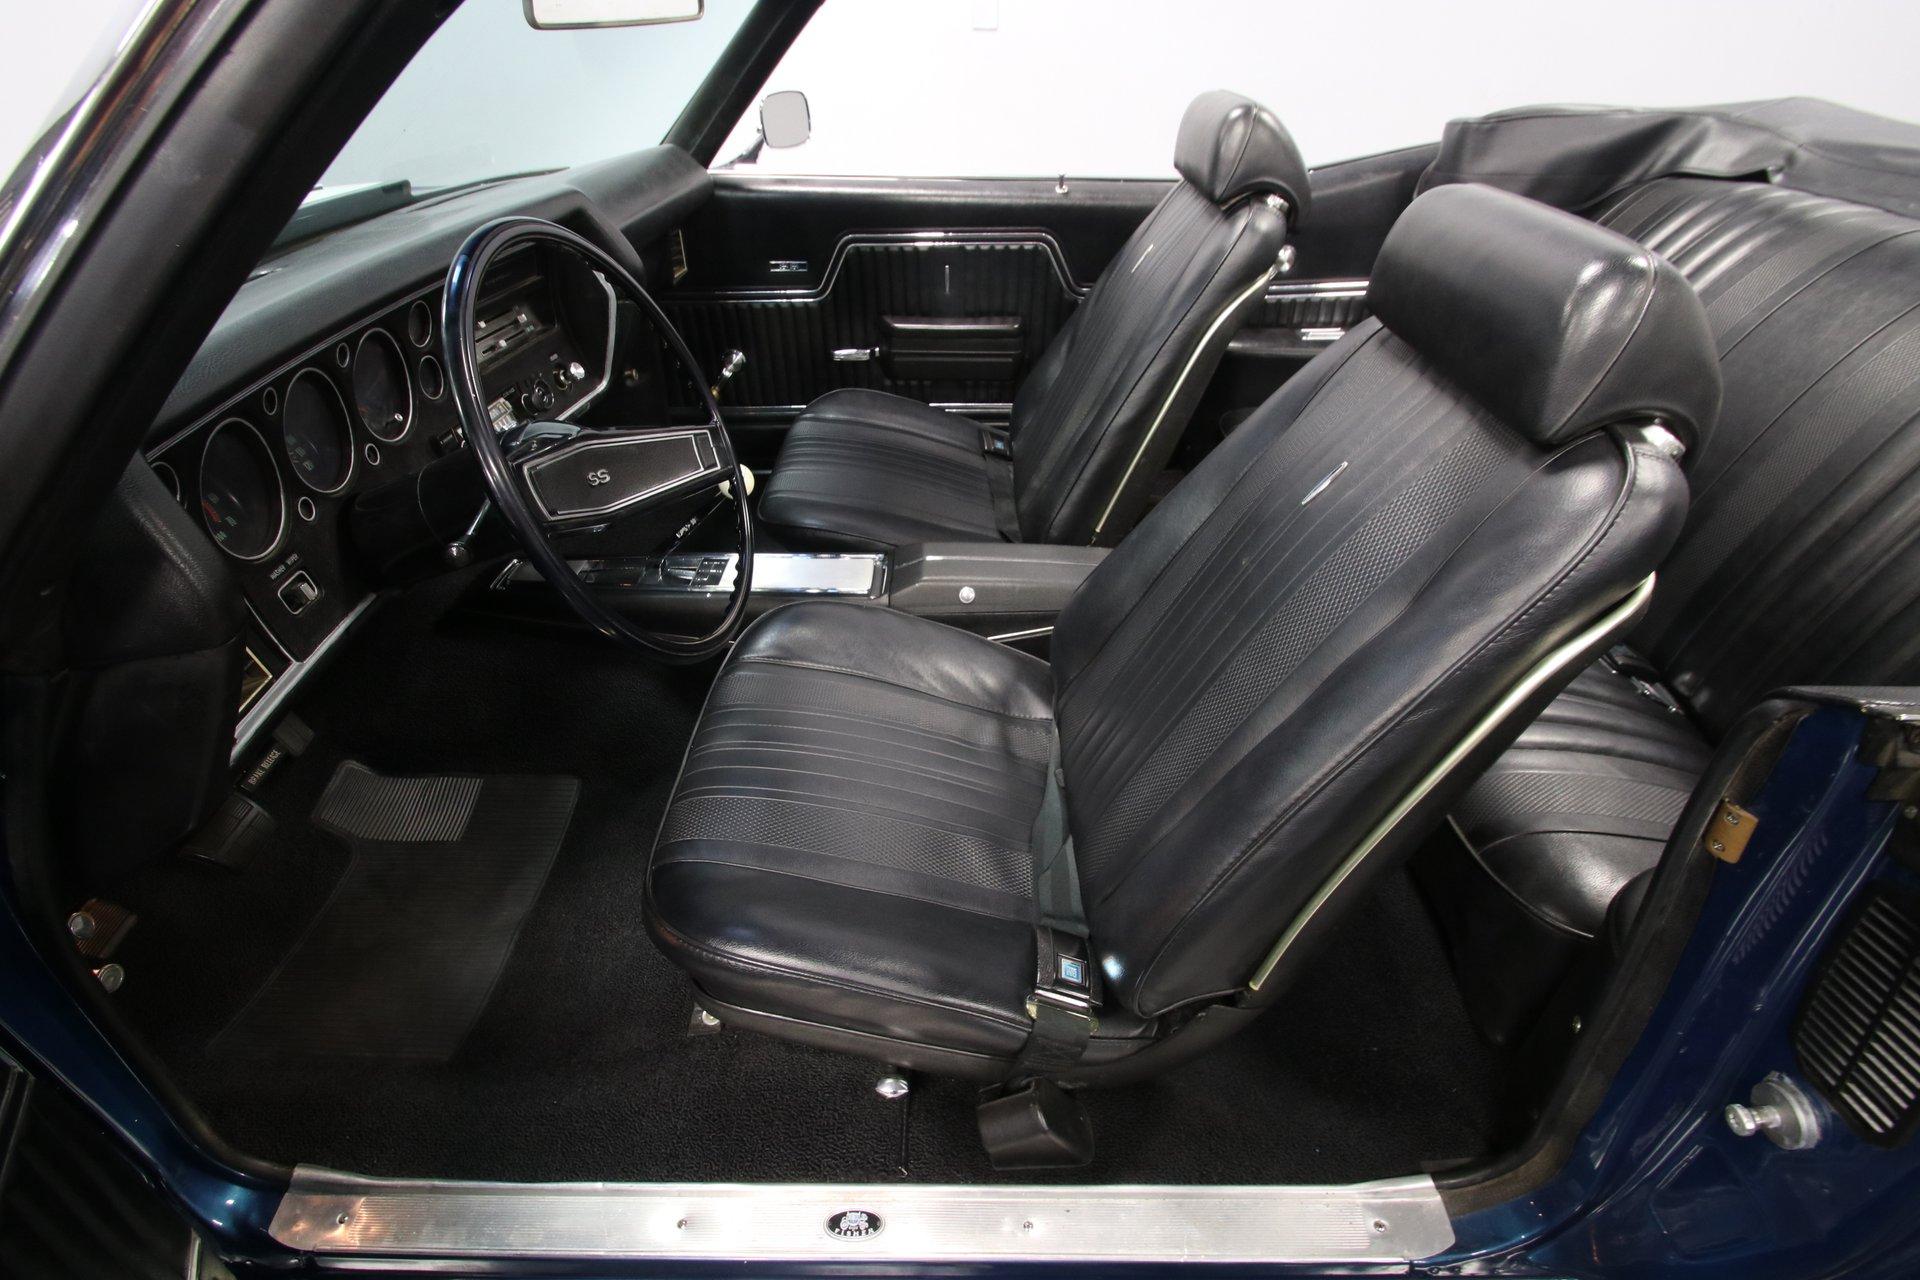 Chevrolet Chevelle SS Convertible 1970